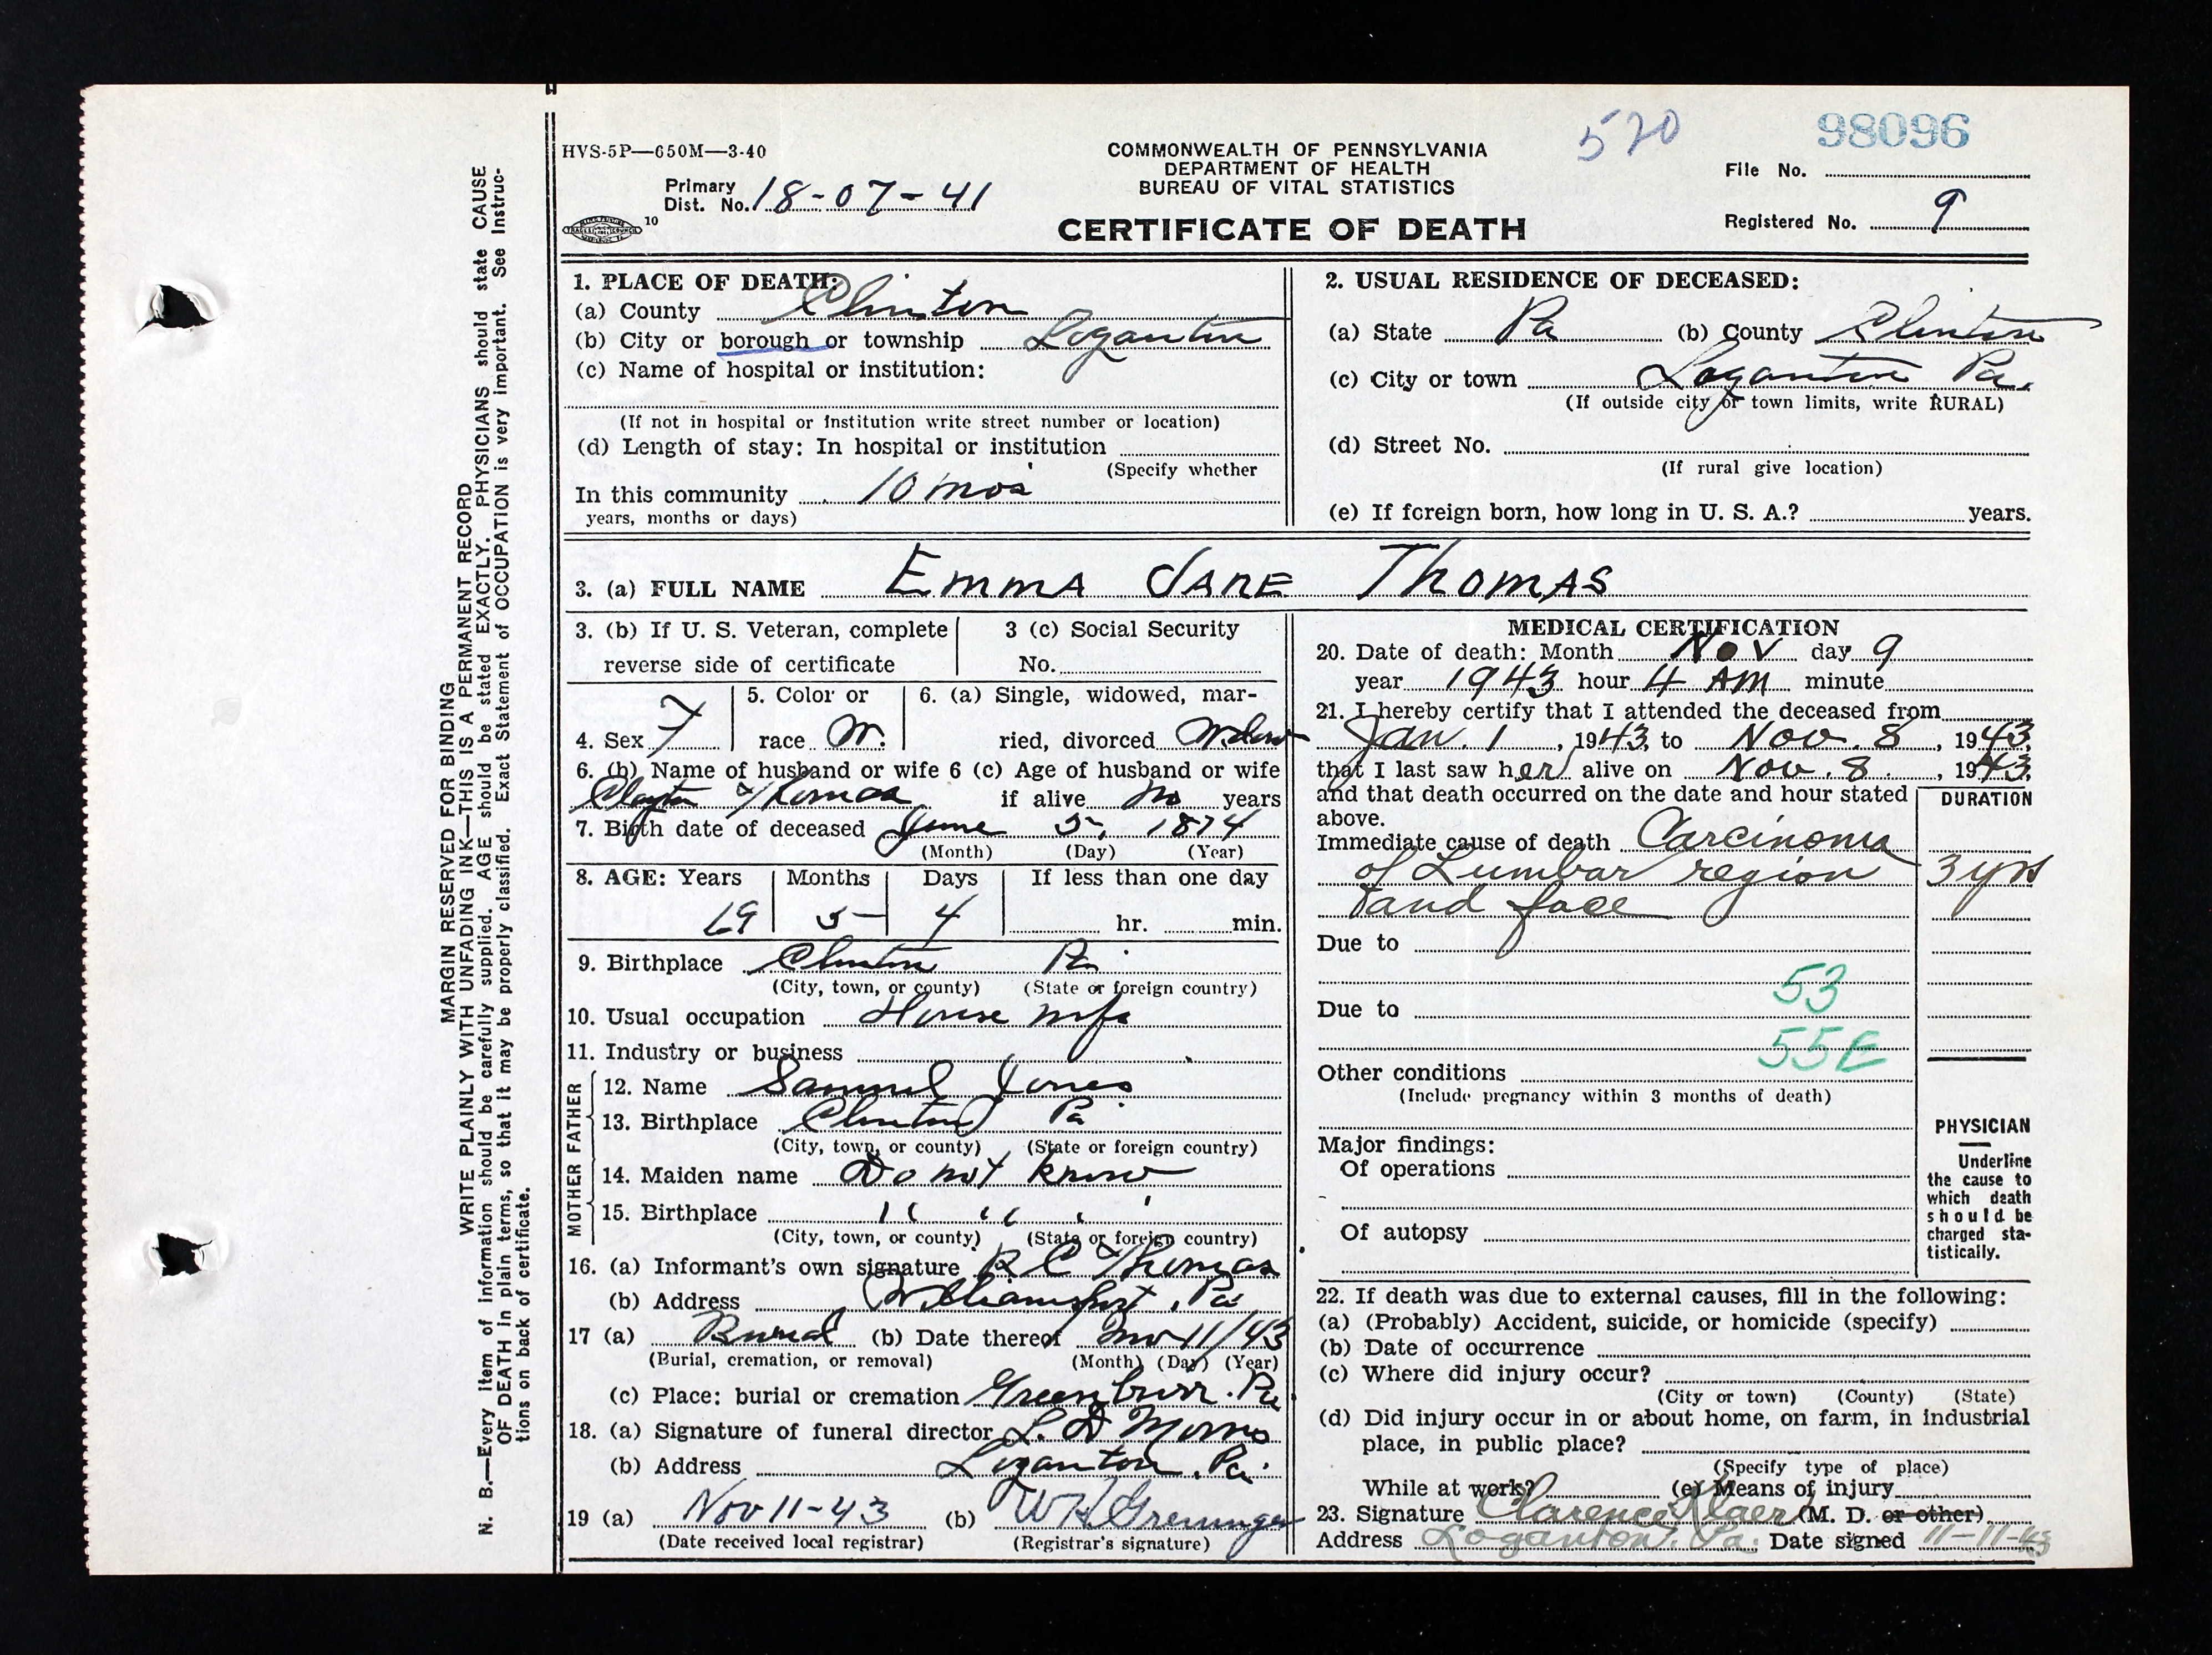 Emma jane jones thomas 1874 1943 find a grave memorial pennsylvania death certificates 1906 1963 for emma jane thomas name emma jane thomas emma jane jones gender female race white marital status widow 1betcityfo Gallery